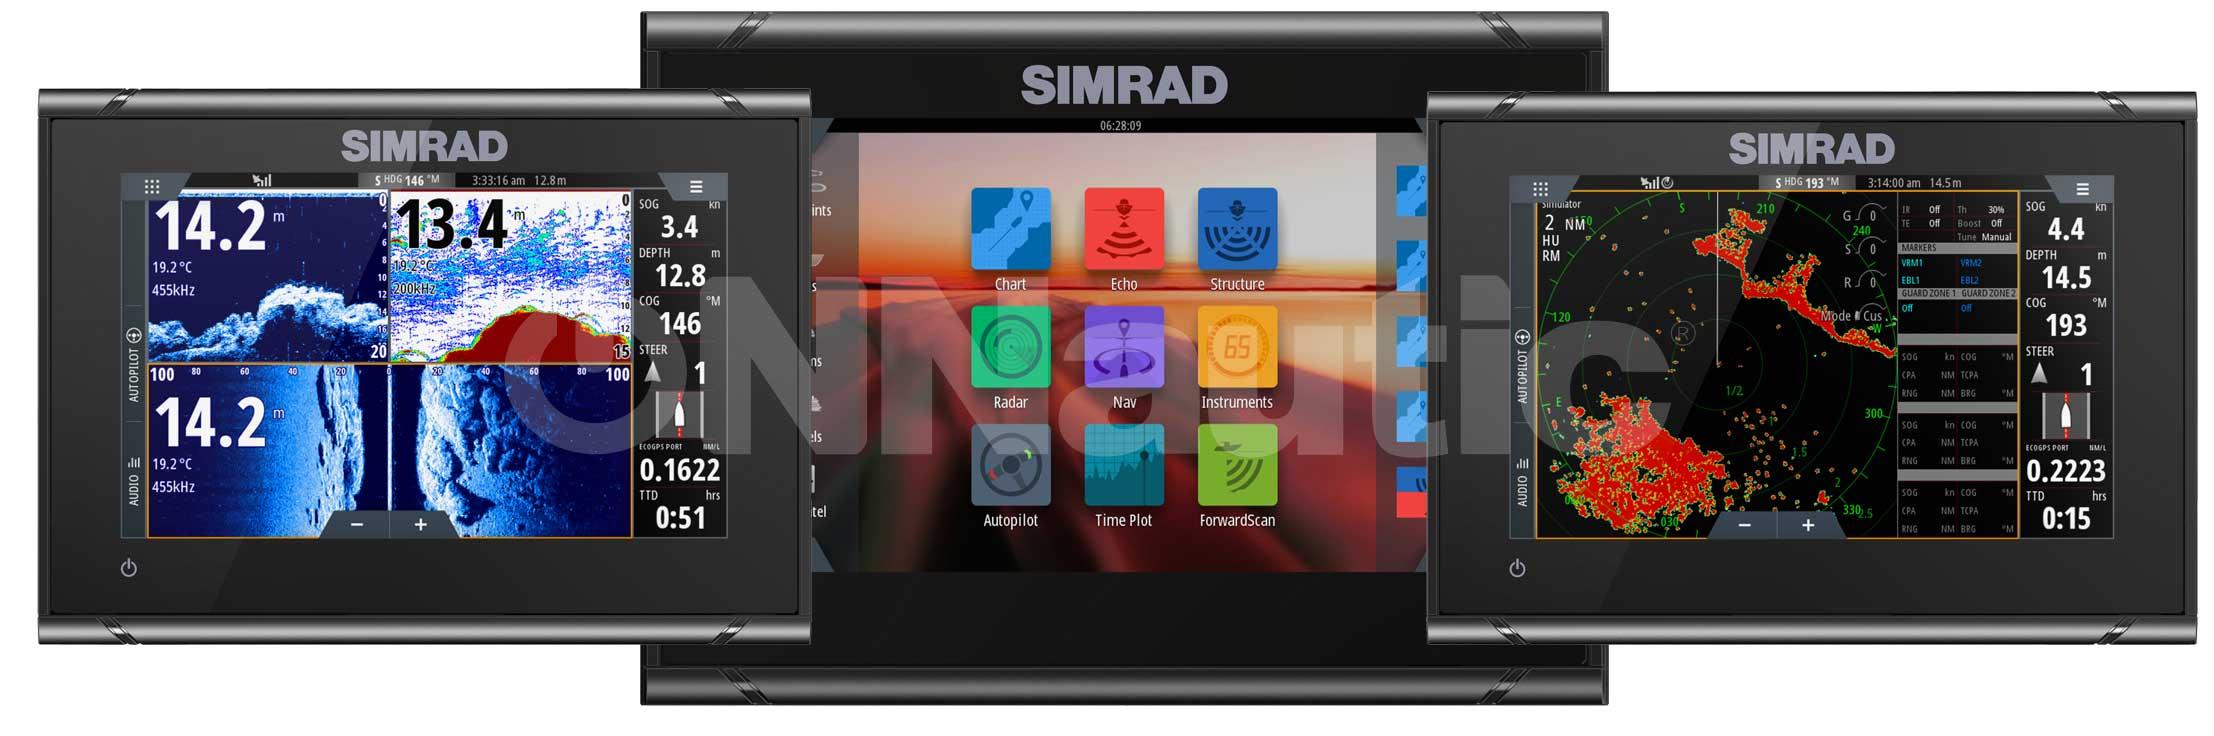 SIMRAD GO Serie